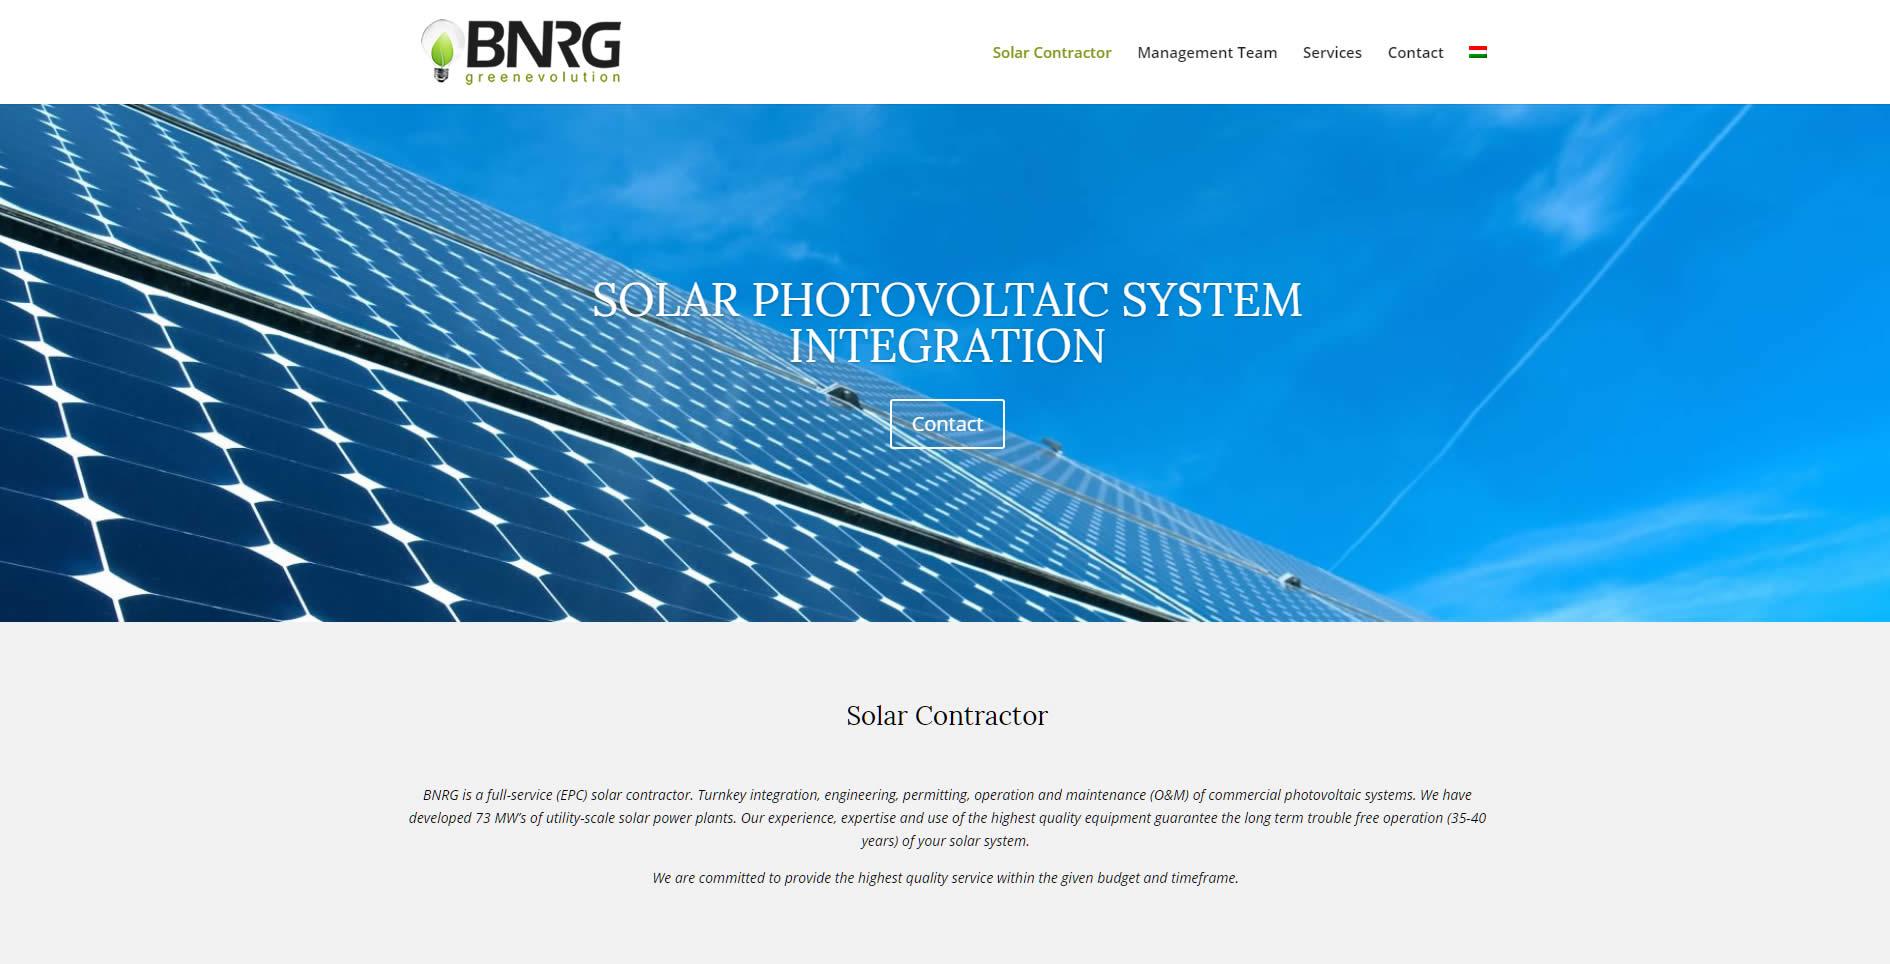 bnrg weboldal angol nyelven